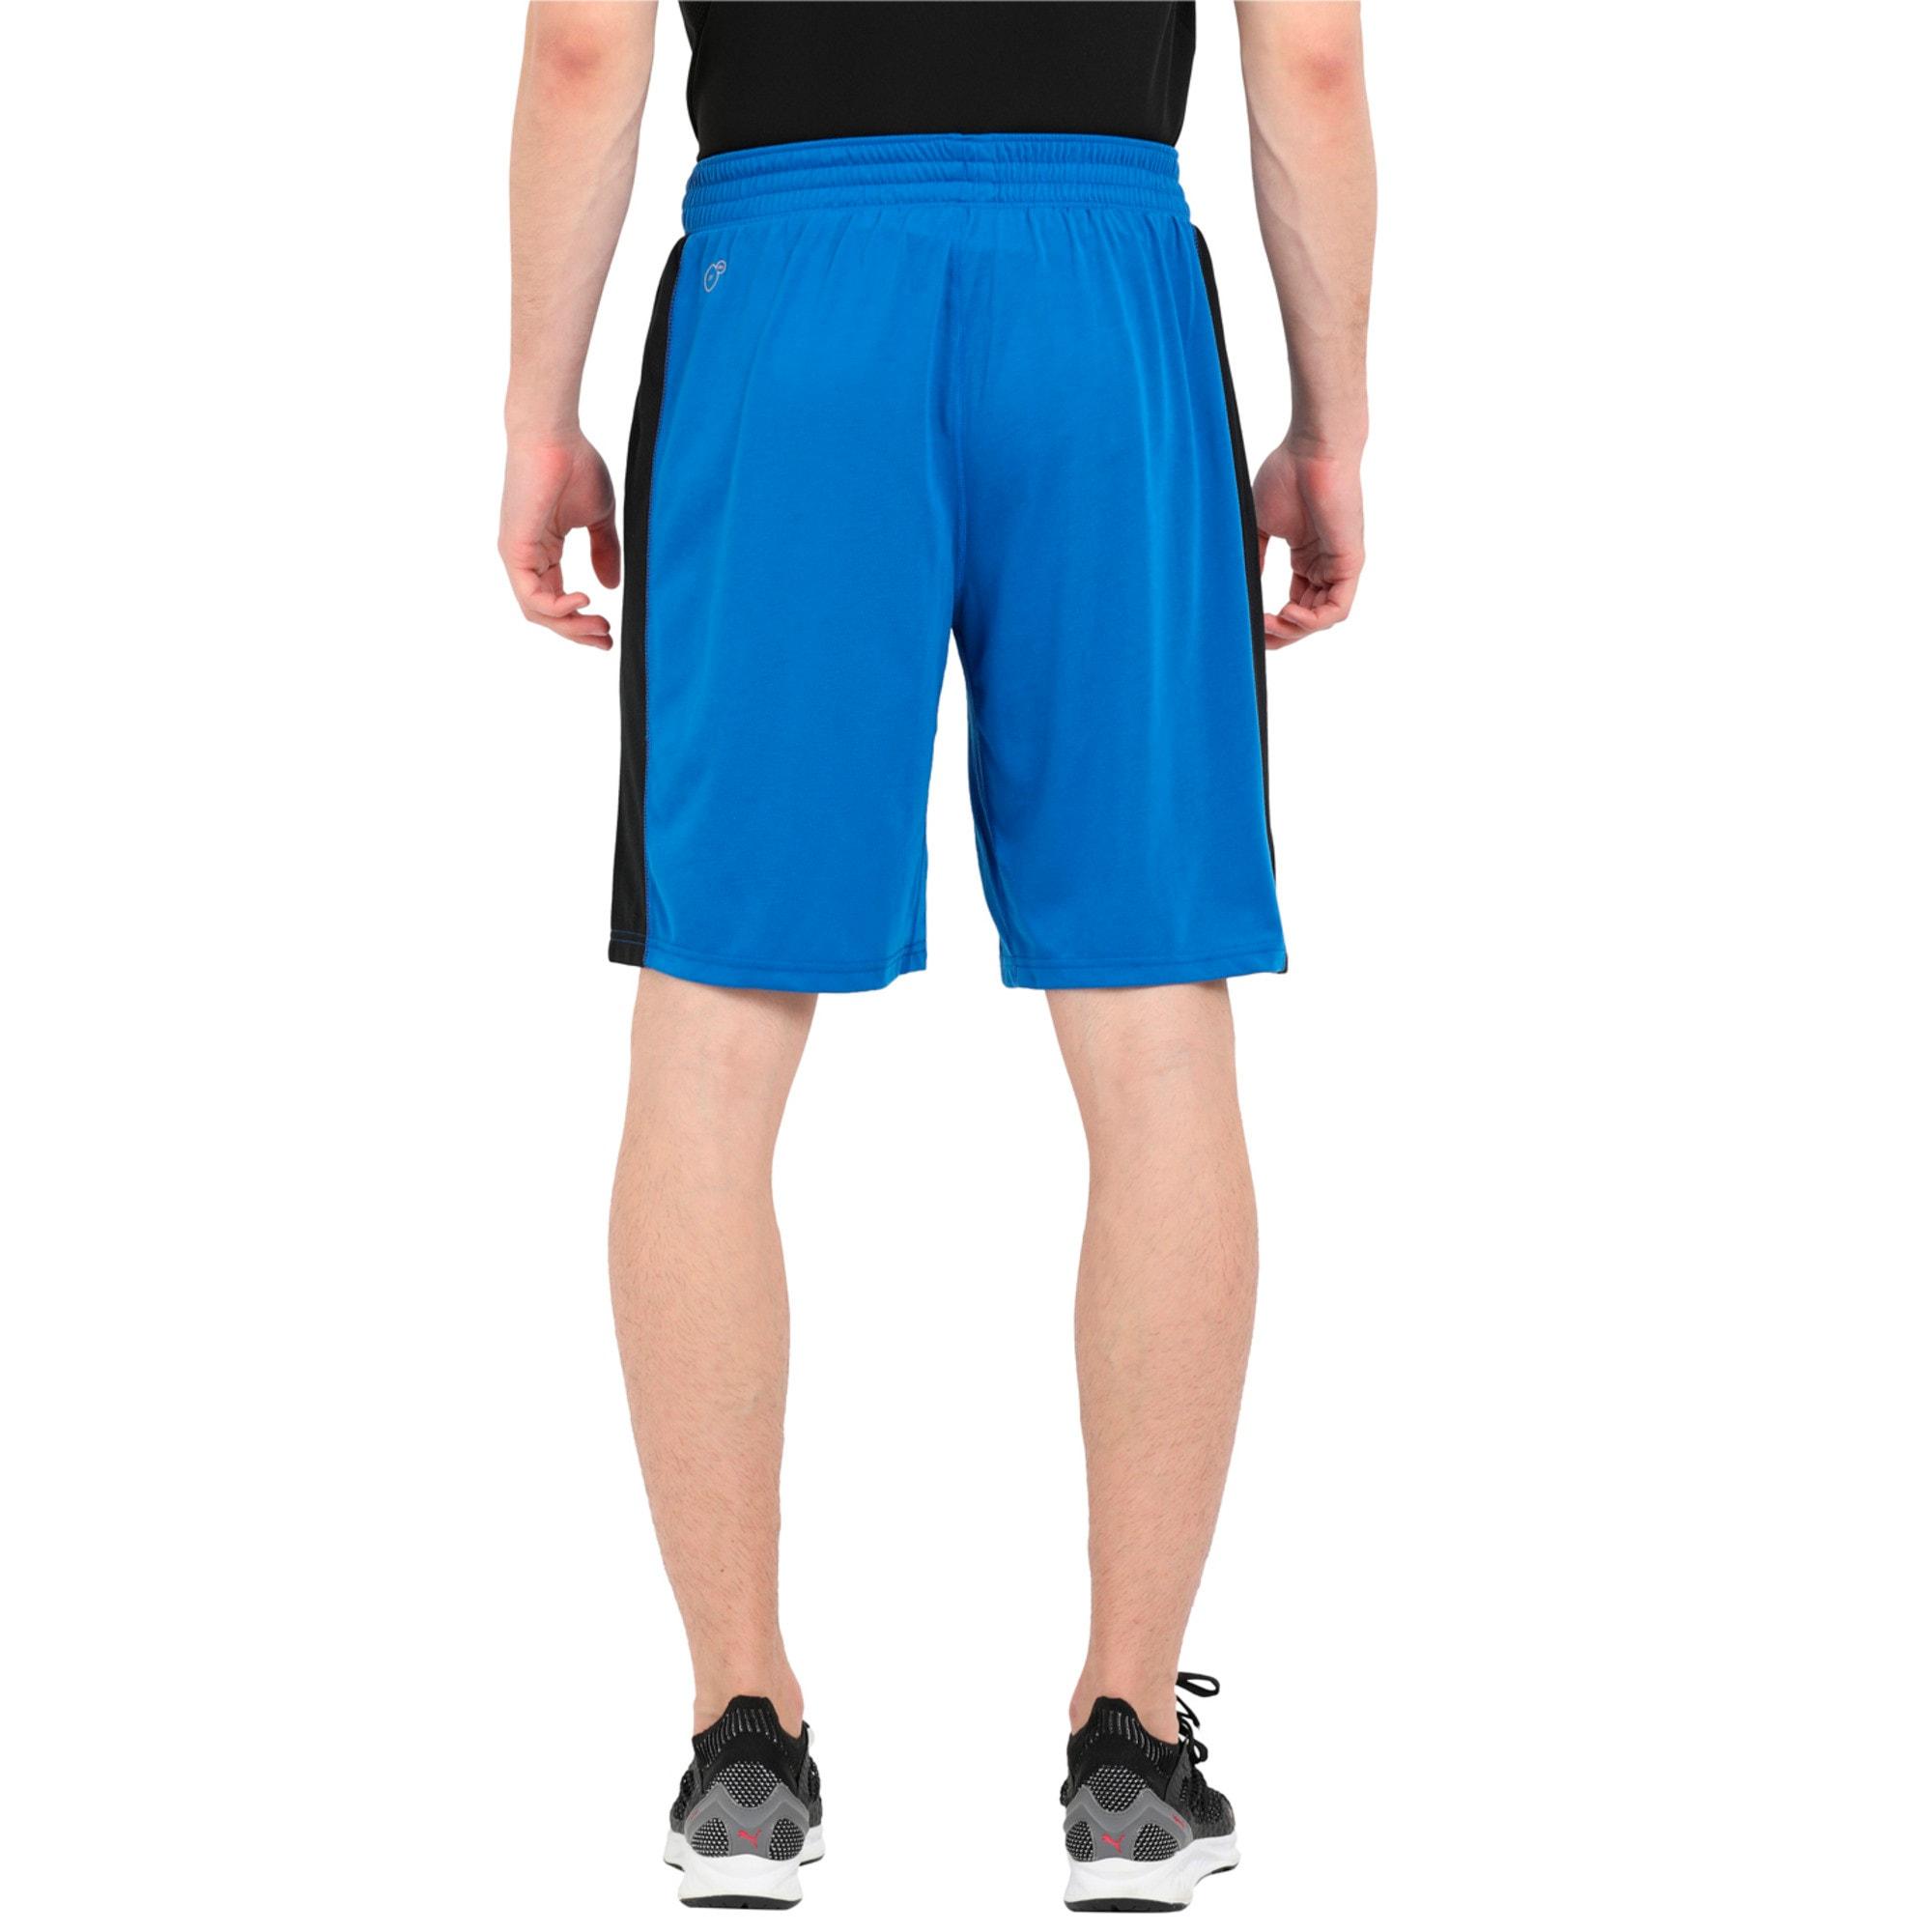 Thumbnail 2 of Essential drirelease Men's Training Shorts, Turkish Sea-Puma Black, medium-IND